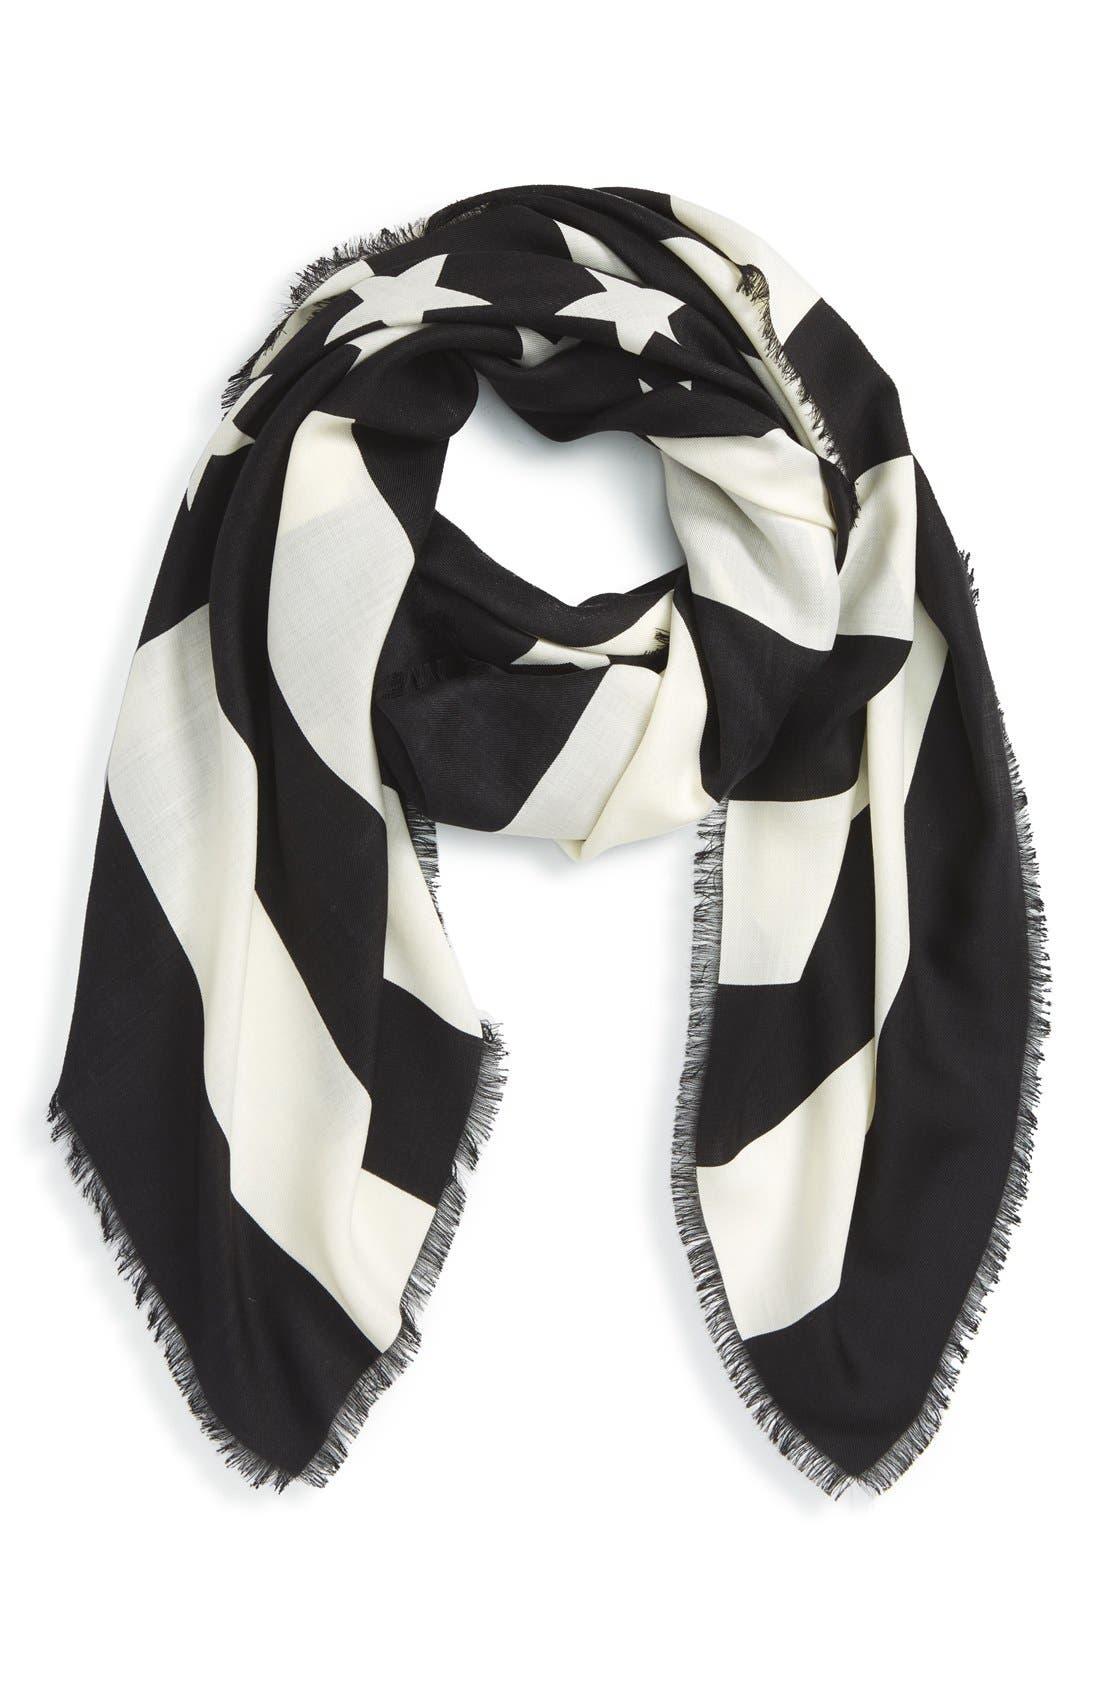 Main Image - Givenchy 'American Flag' Wool & Silk Scarf